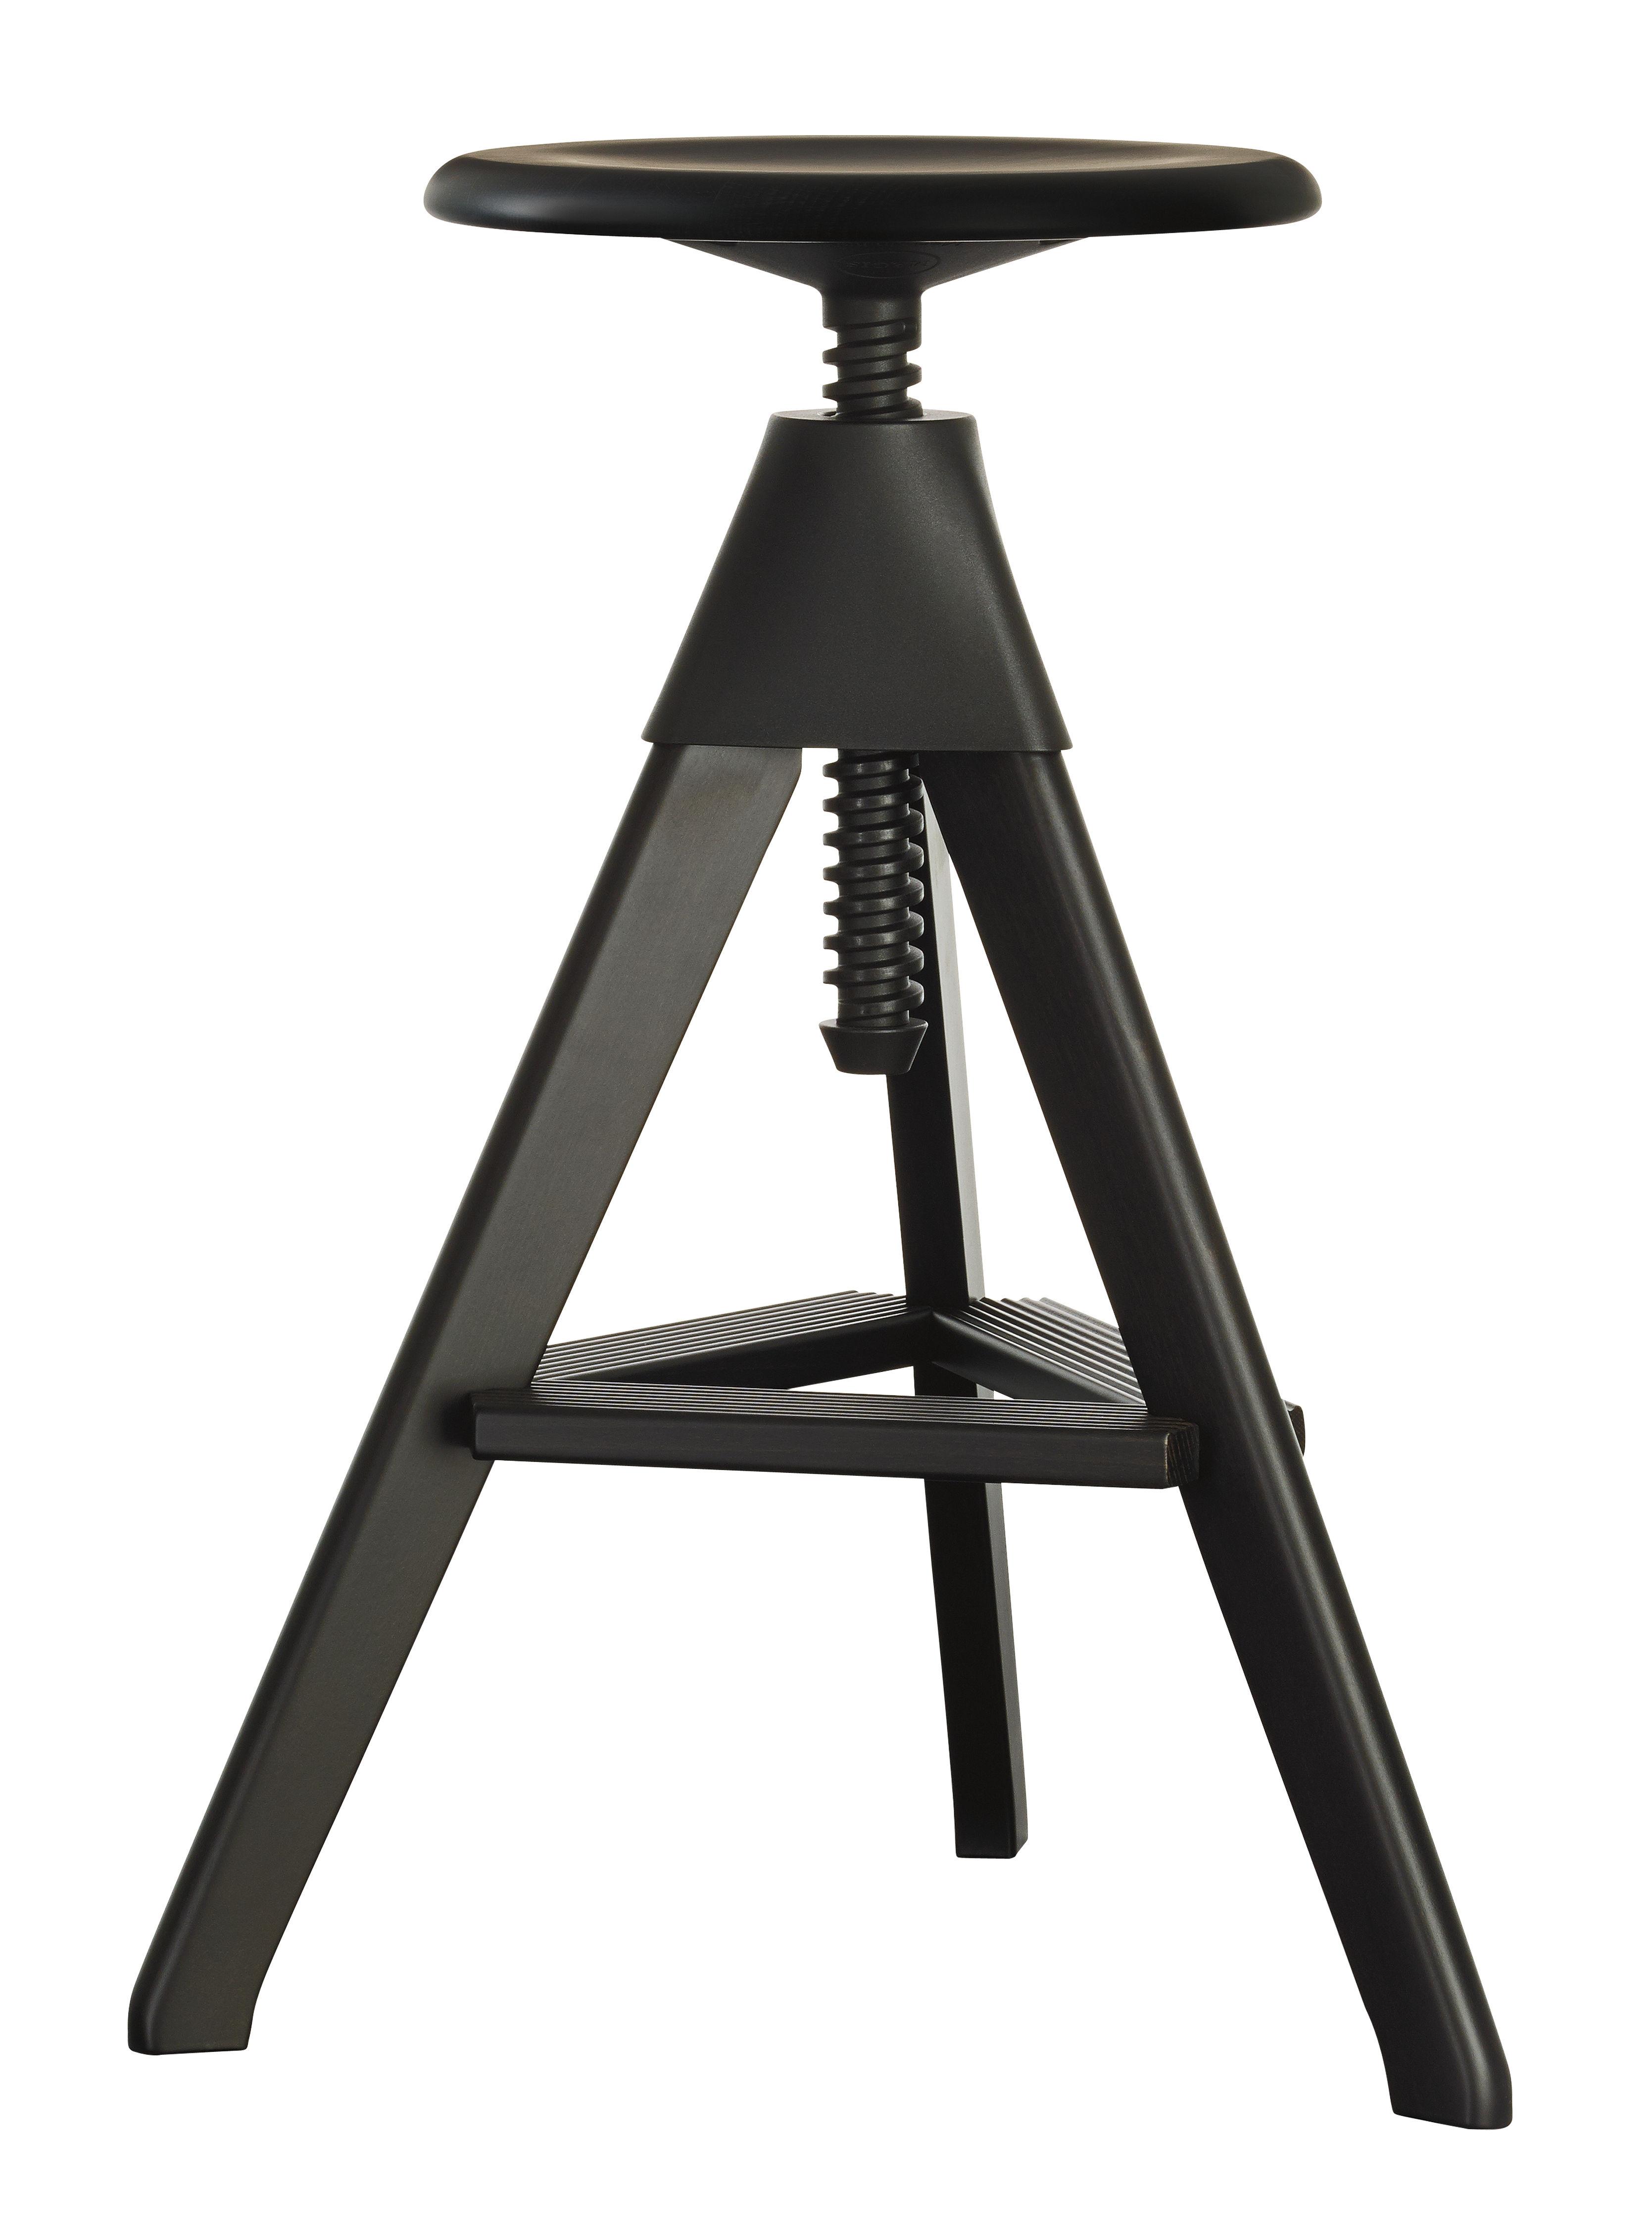 tabouret haut r glable tom pivotant bois plastique noir magis. Black Bedroom Furniture Sets. Home Design Ideas